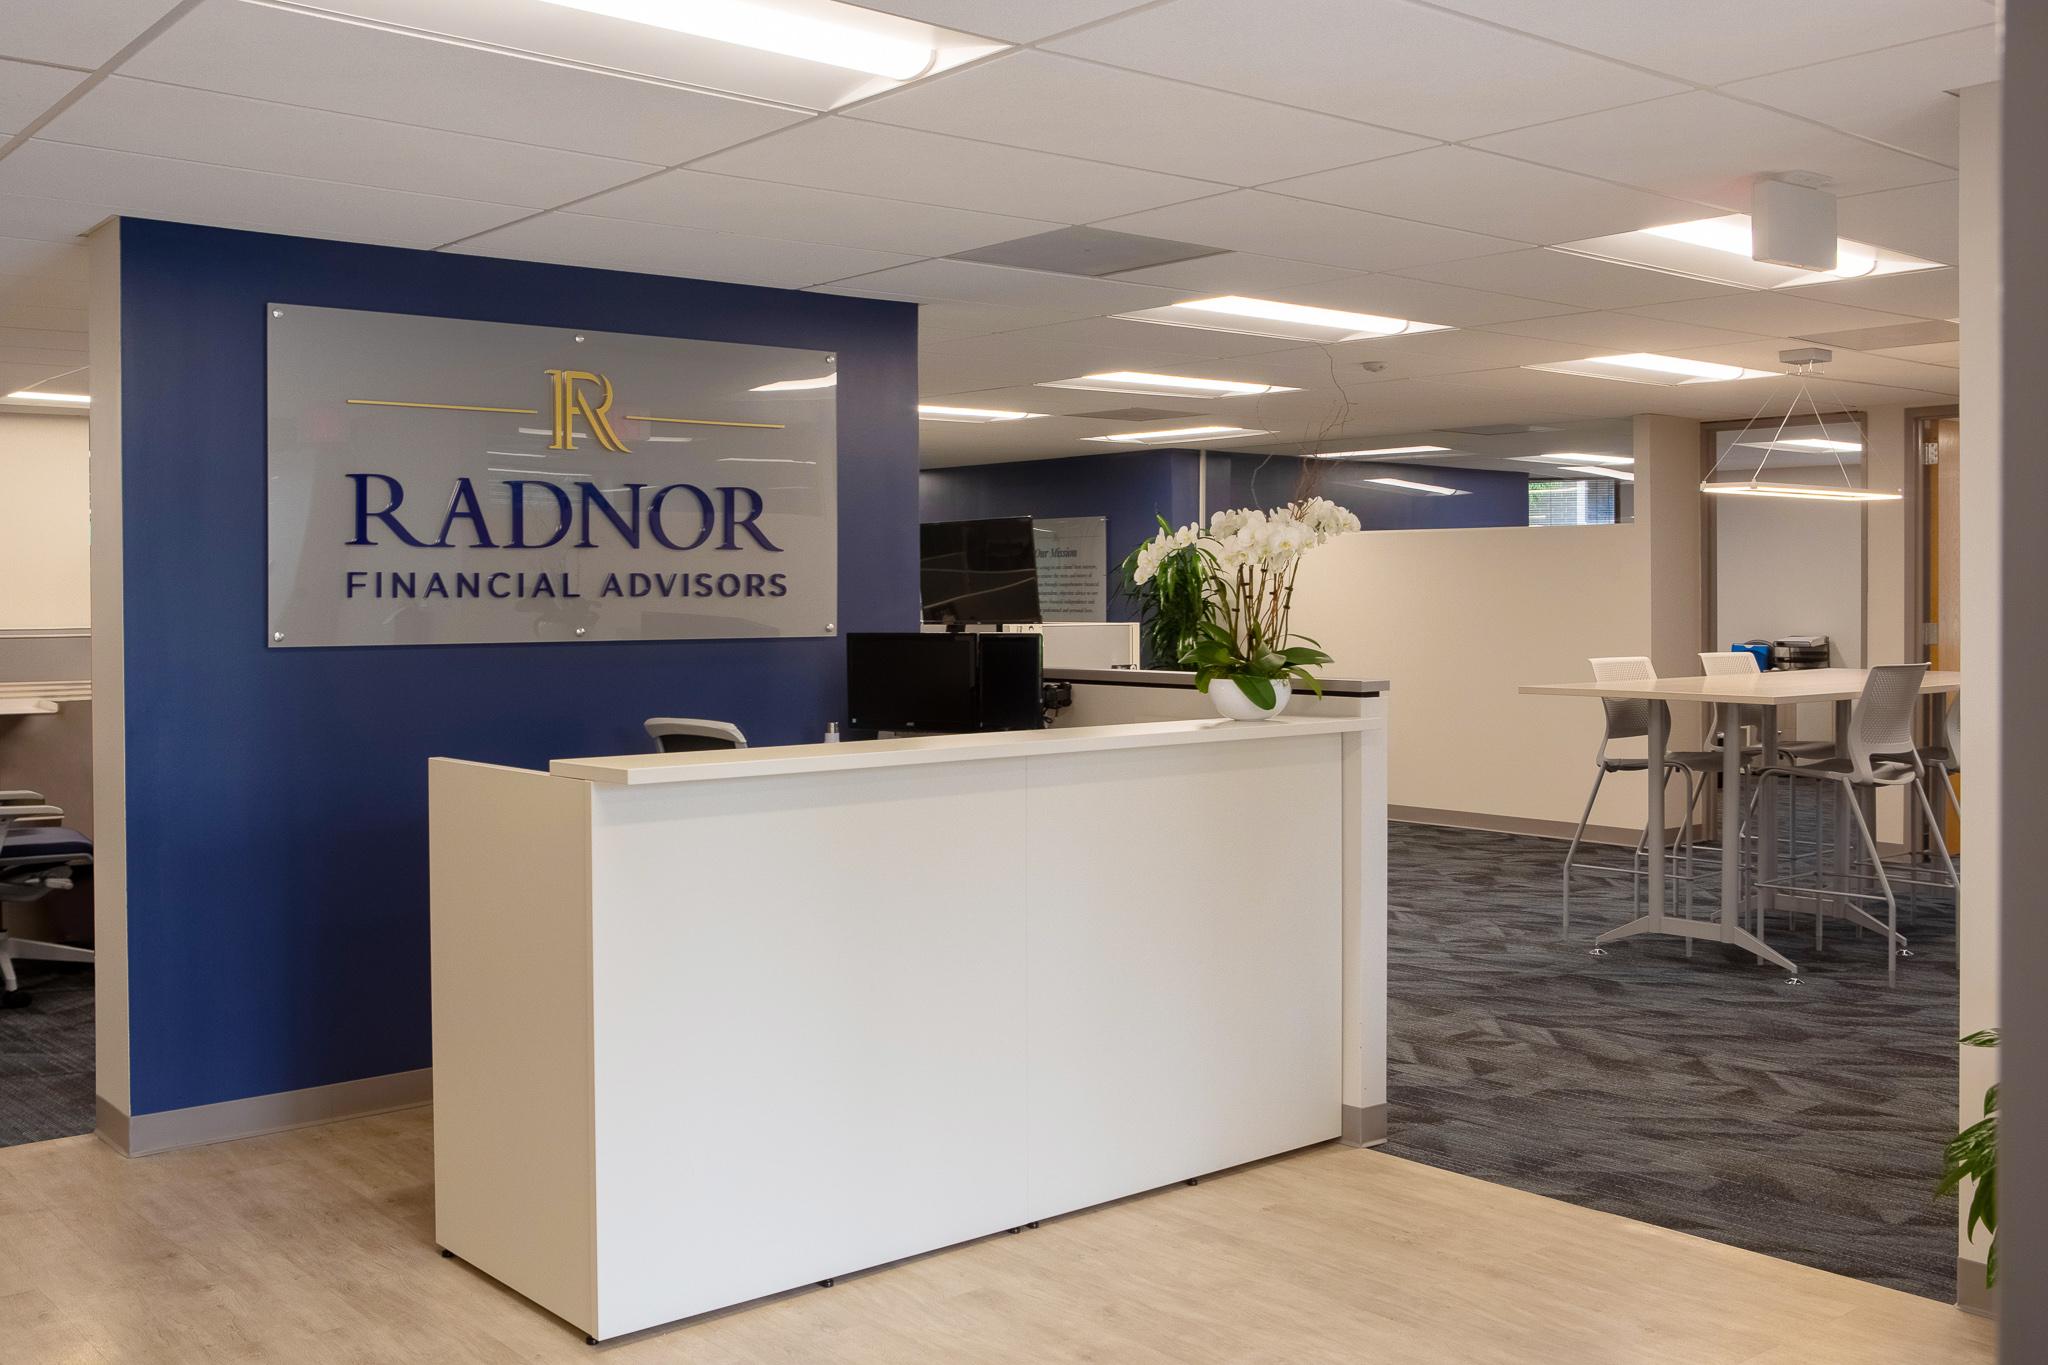 Radnor Financial